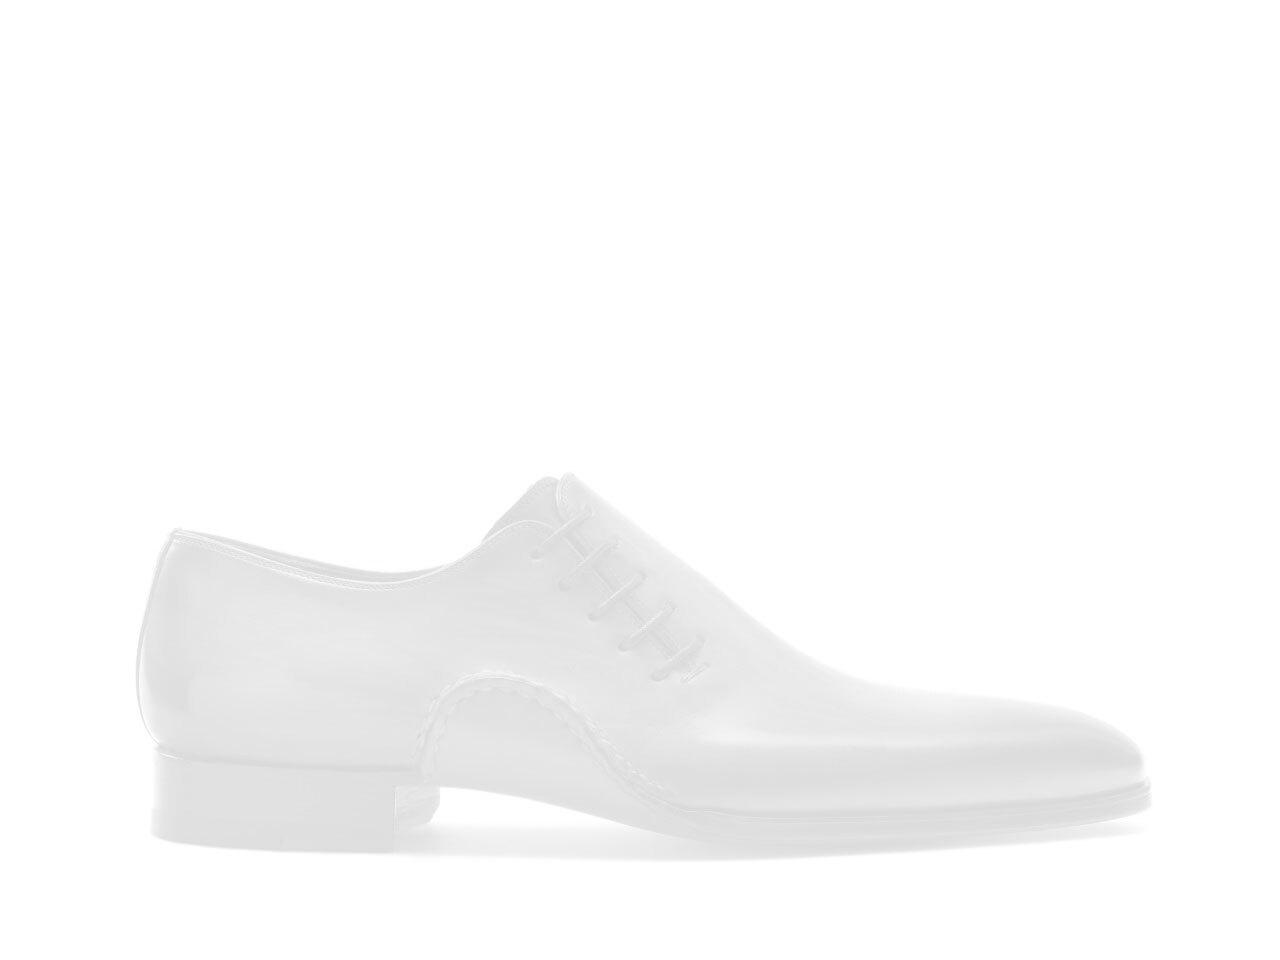 Pair of the Magnanni Estovan Midbrown and Cuero Men's Oxford Shoes